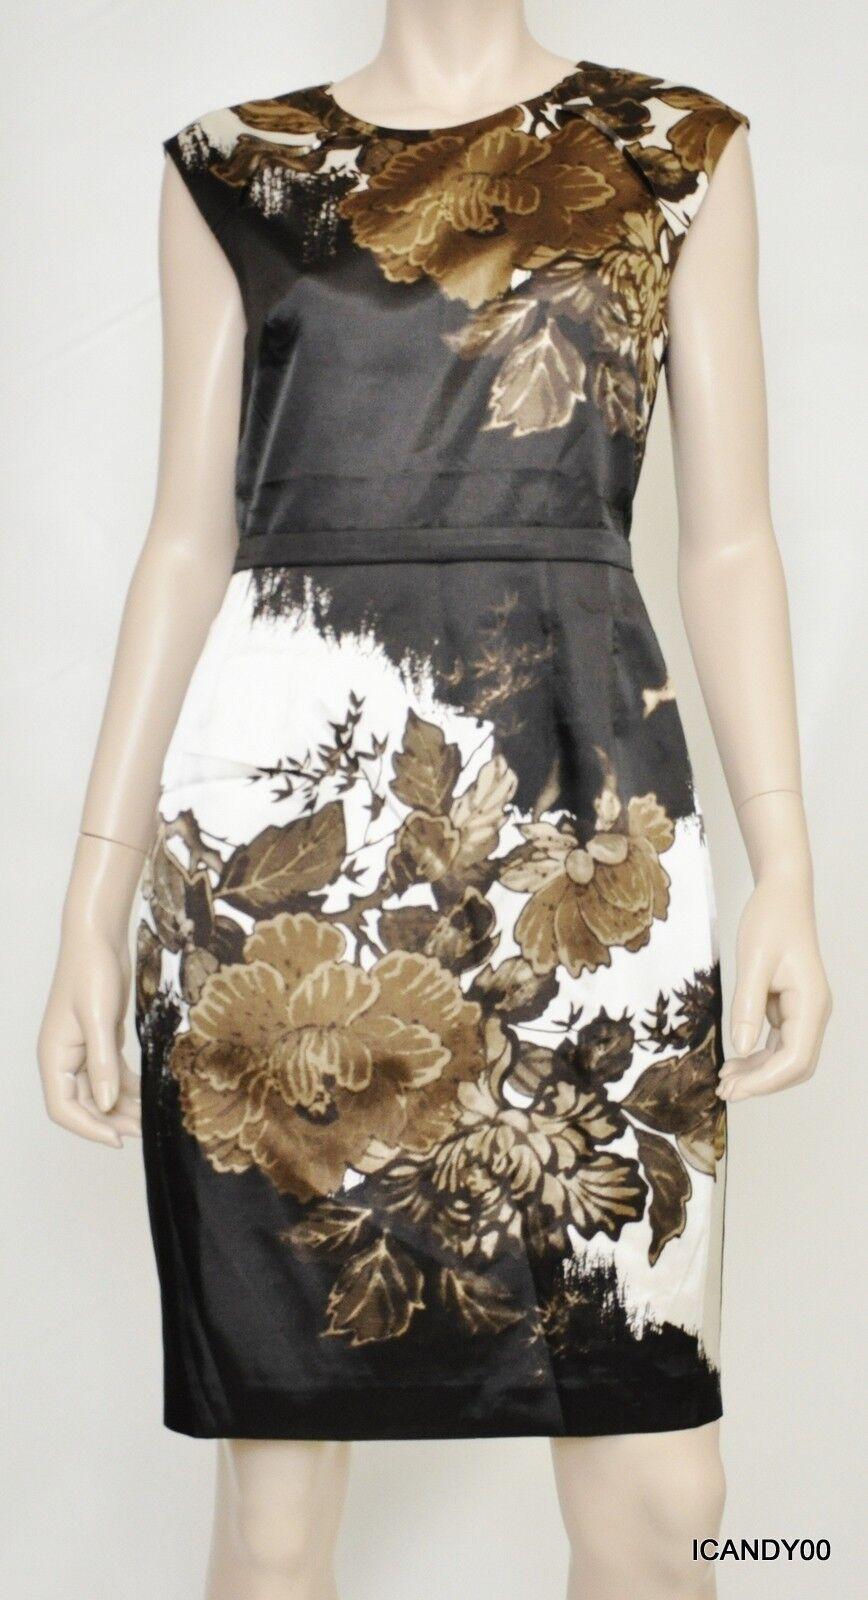 Nwt Nwt Nwt  248 Tahari SHANA Floral Stretch Sheath Lined Dress Top Tunic Brown 6 c3181d